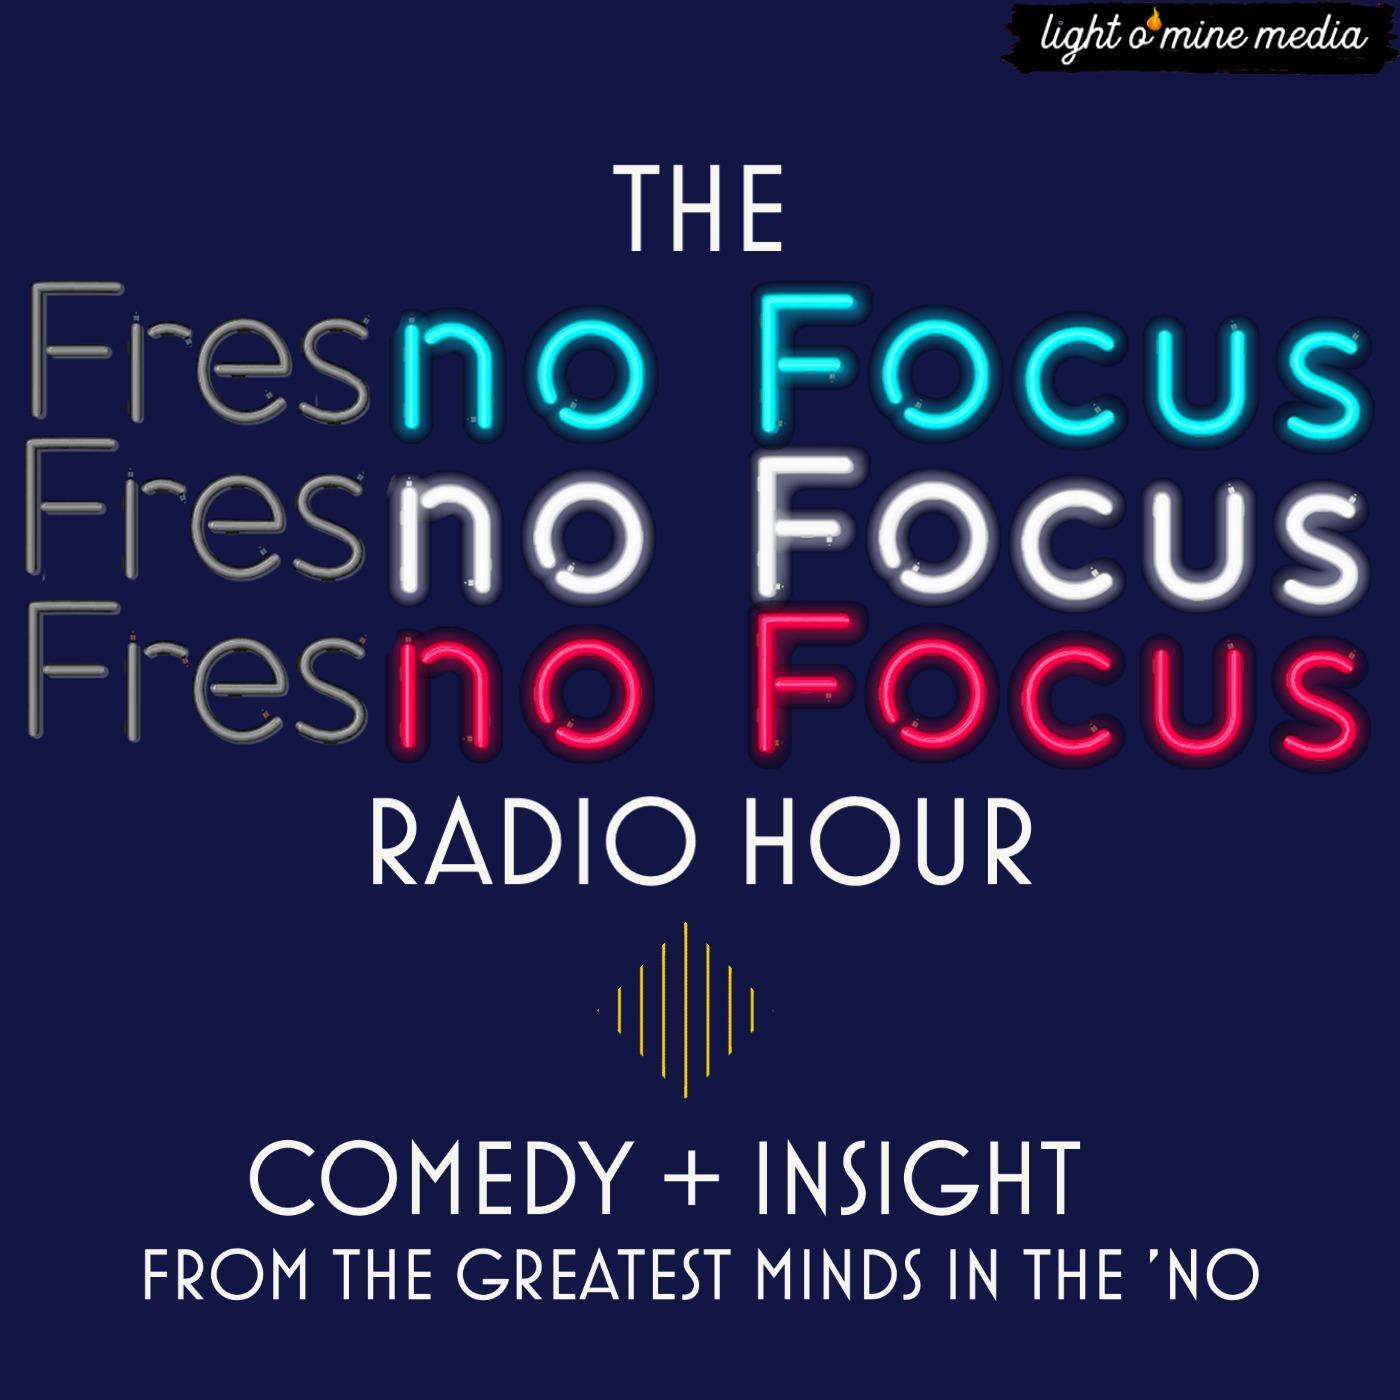 The no Focus Radio Hour